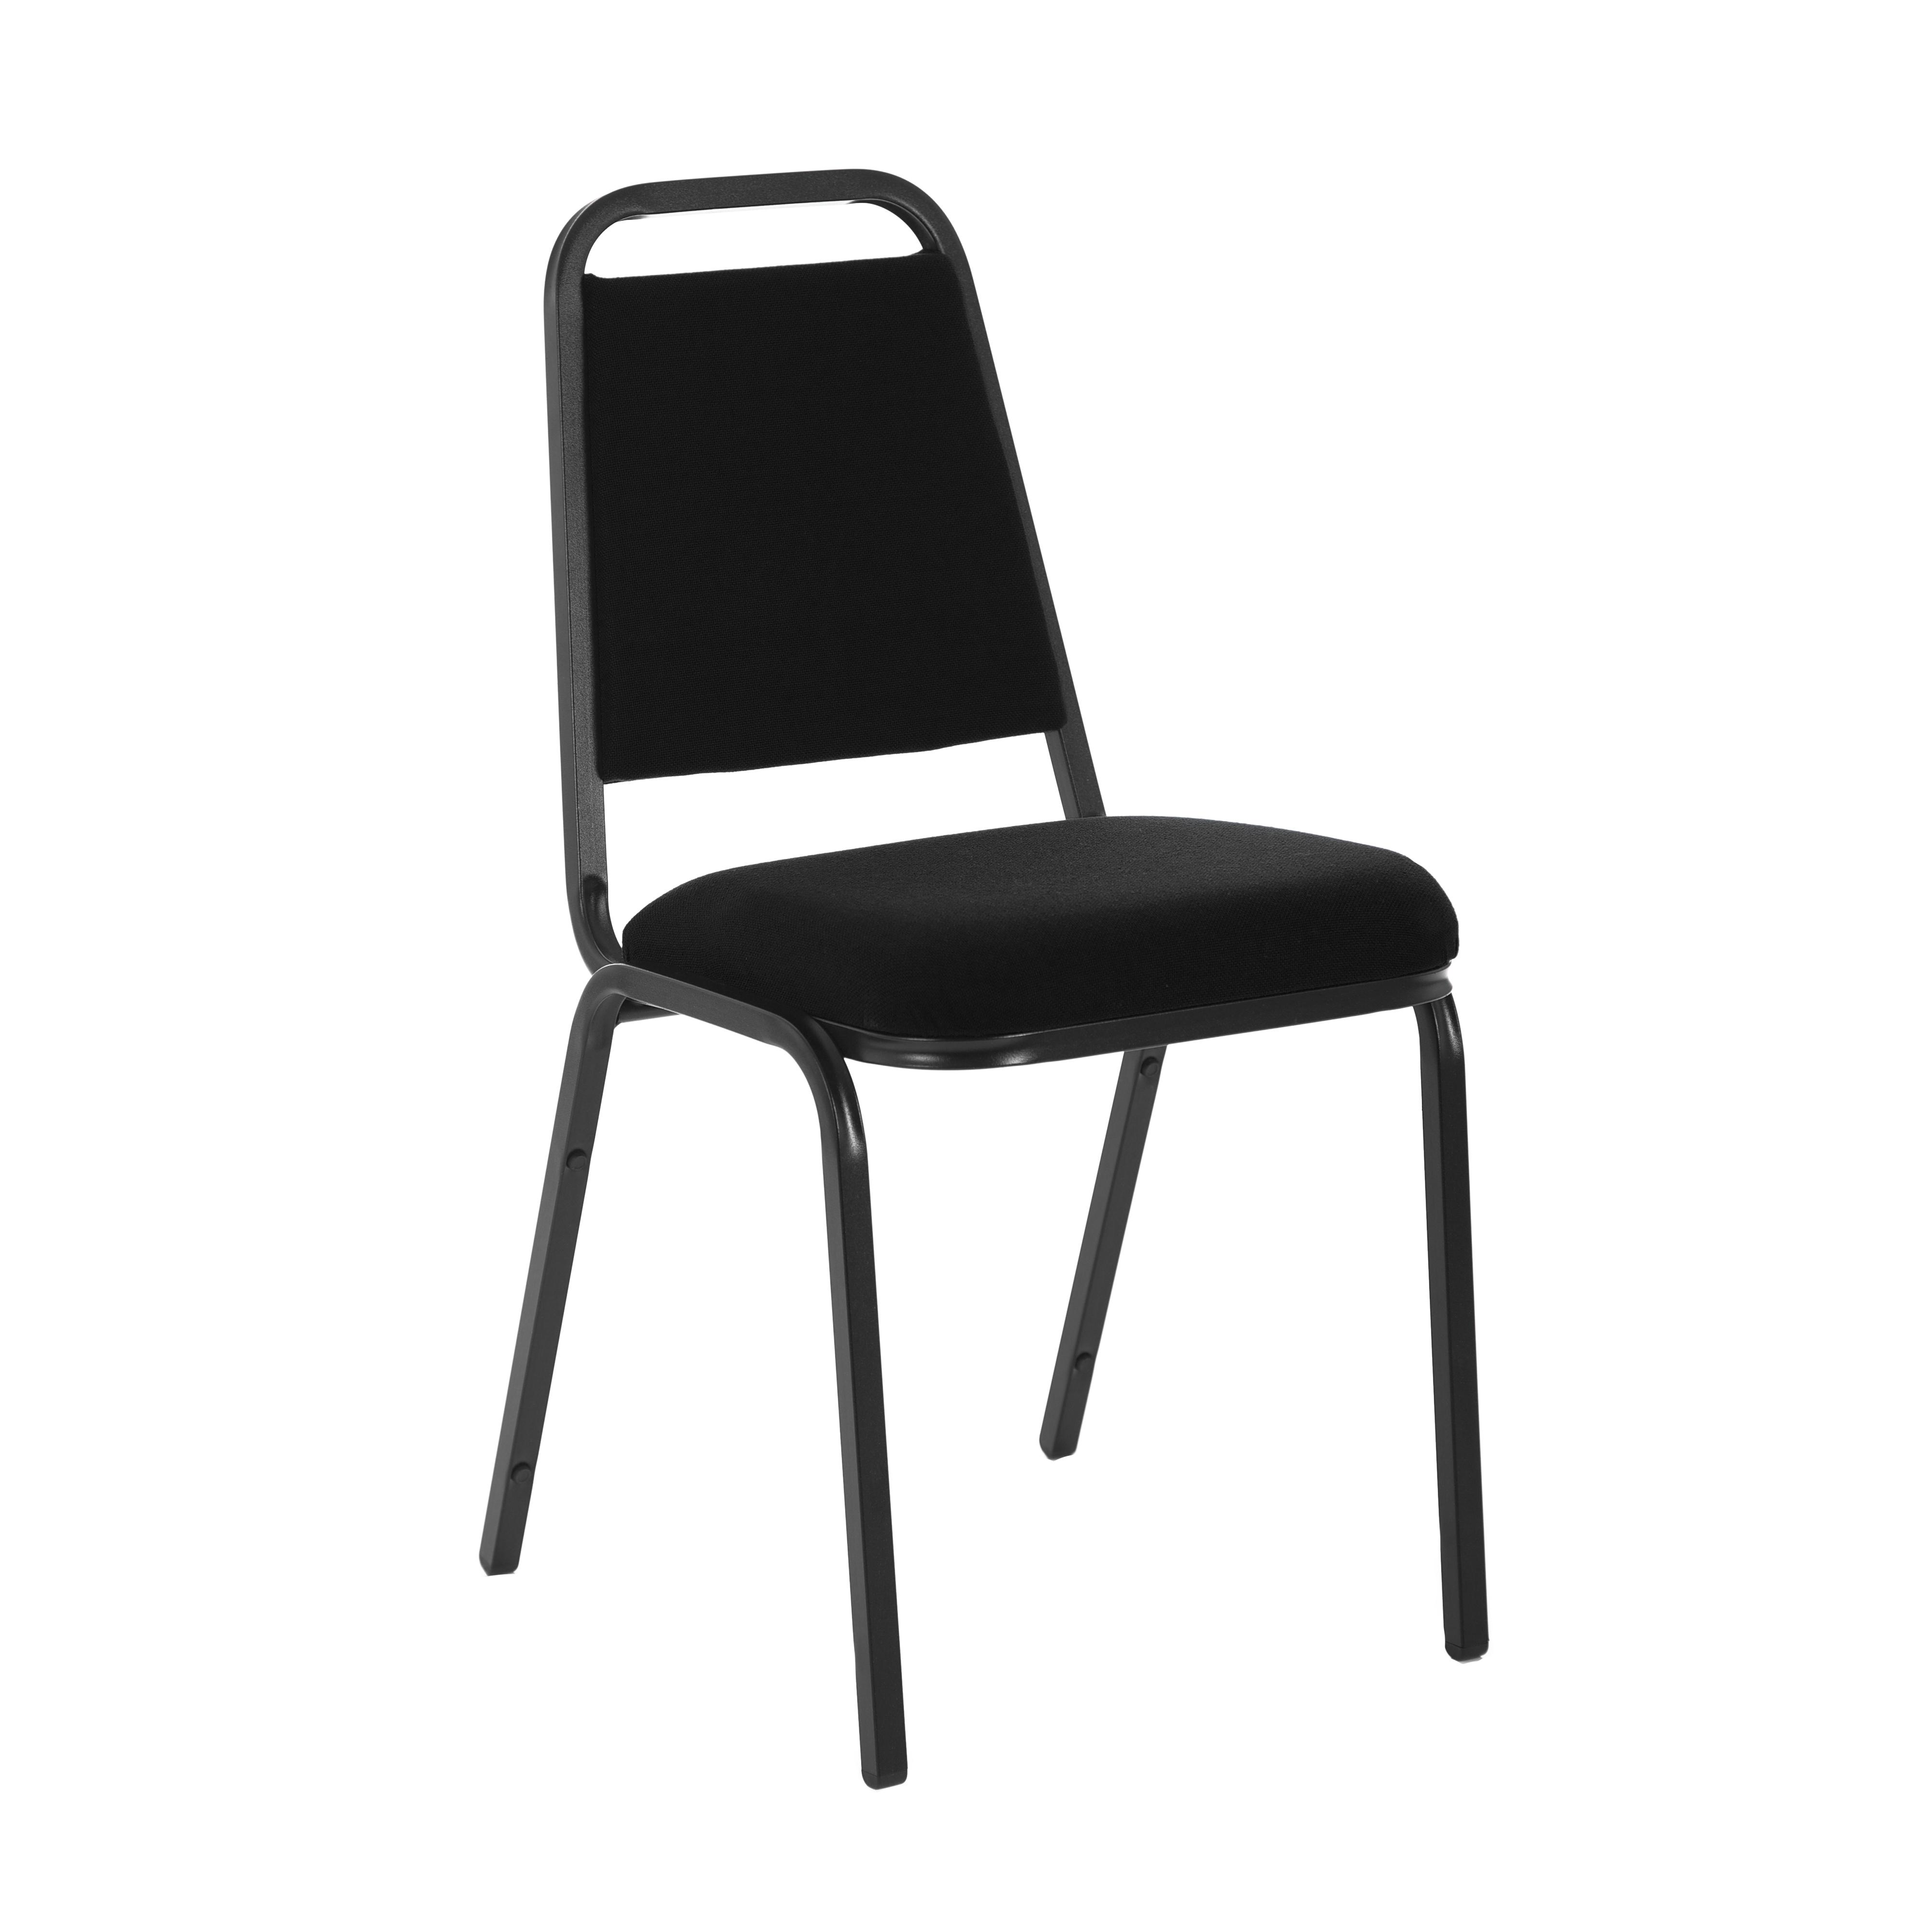 &Trexus Banquet Chair Black/Black Frame 390x355x485mm Ref